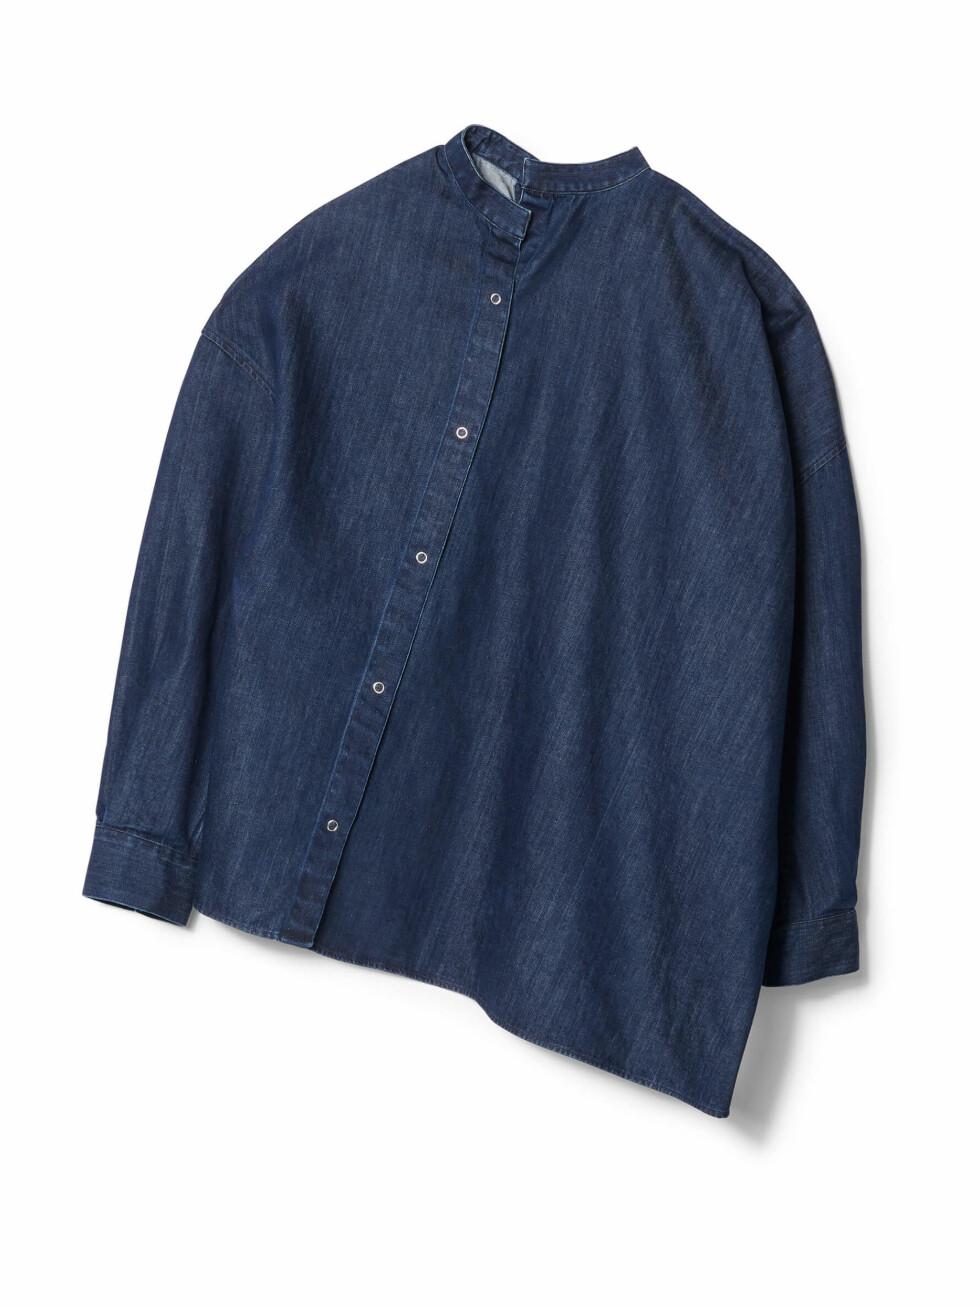 Skjorte fra Toteme |1600,-| https://toteme-studio.com/product/noma-denim-shirt/